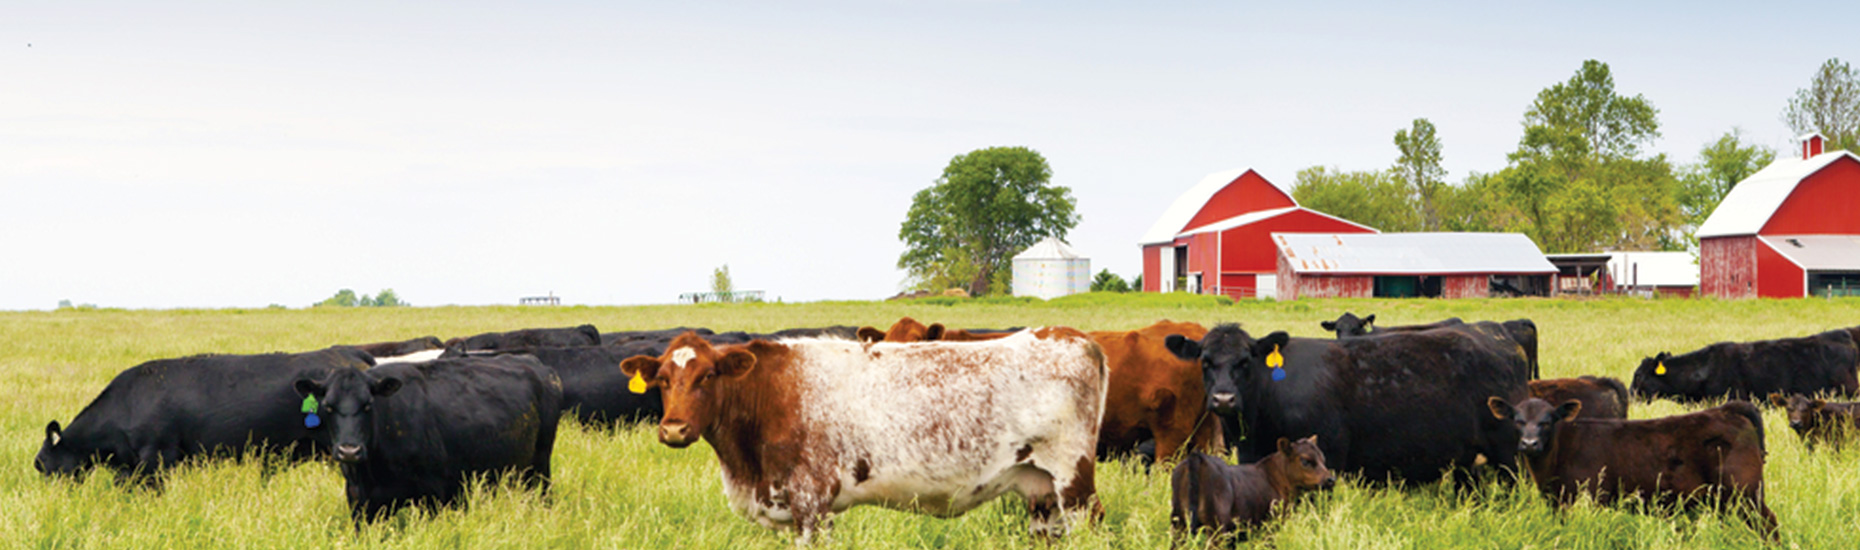 cattleontherange